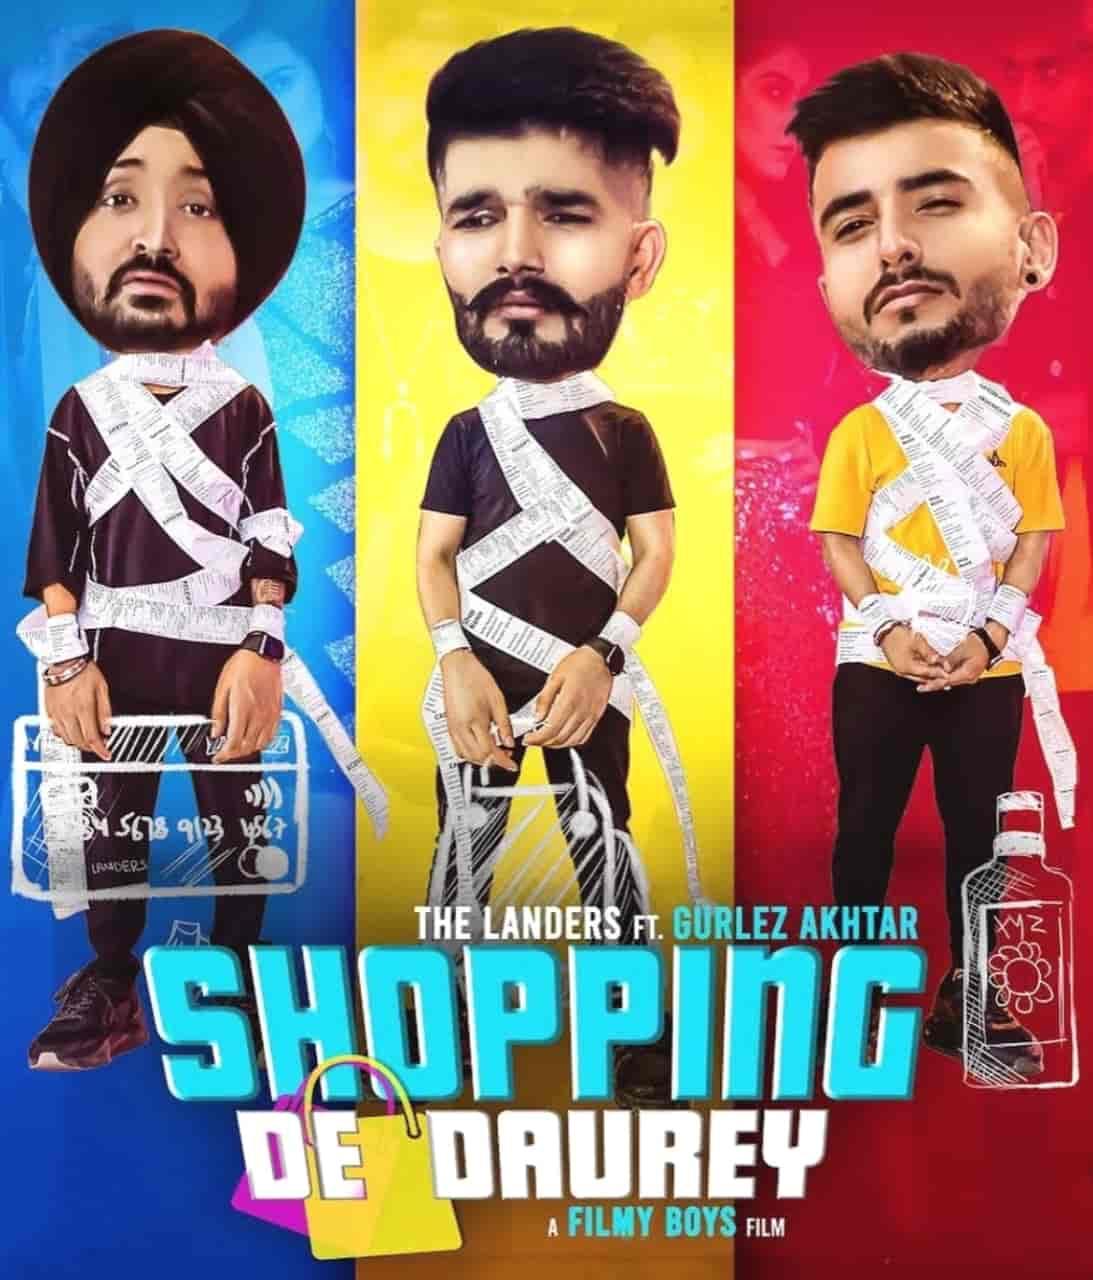 Shopping De Daurey Punjabi Song Image Features The Landers